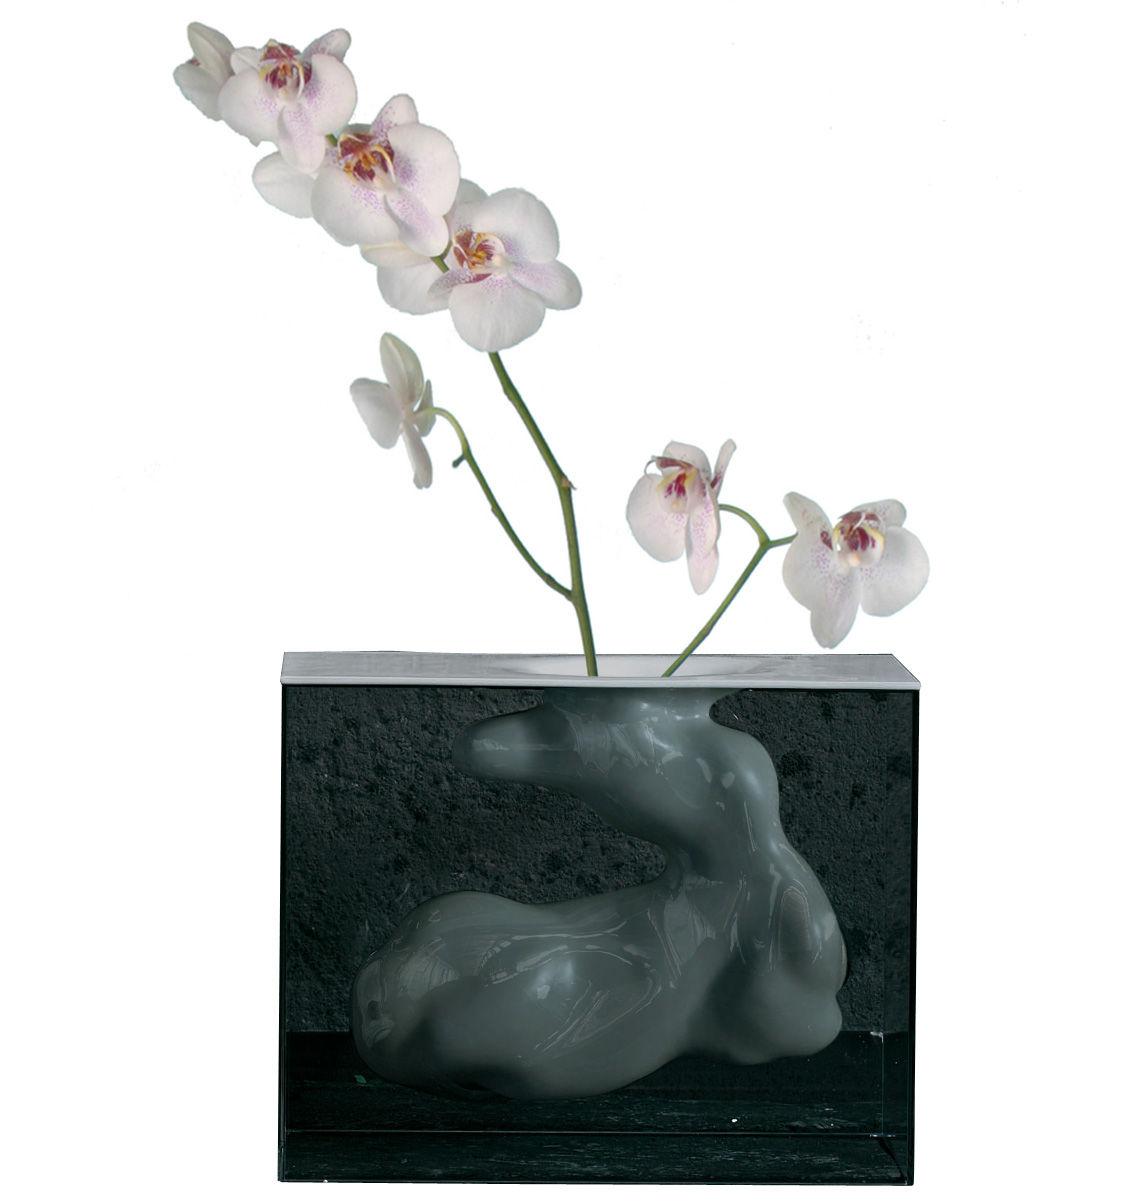 Dekoration - Vasen - Angela Vase H 45 cm - Glas Italia - Rauchglas - Weiß - Cristal trempé, Keramik